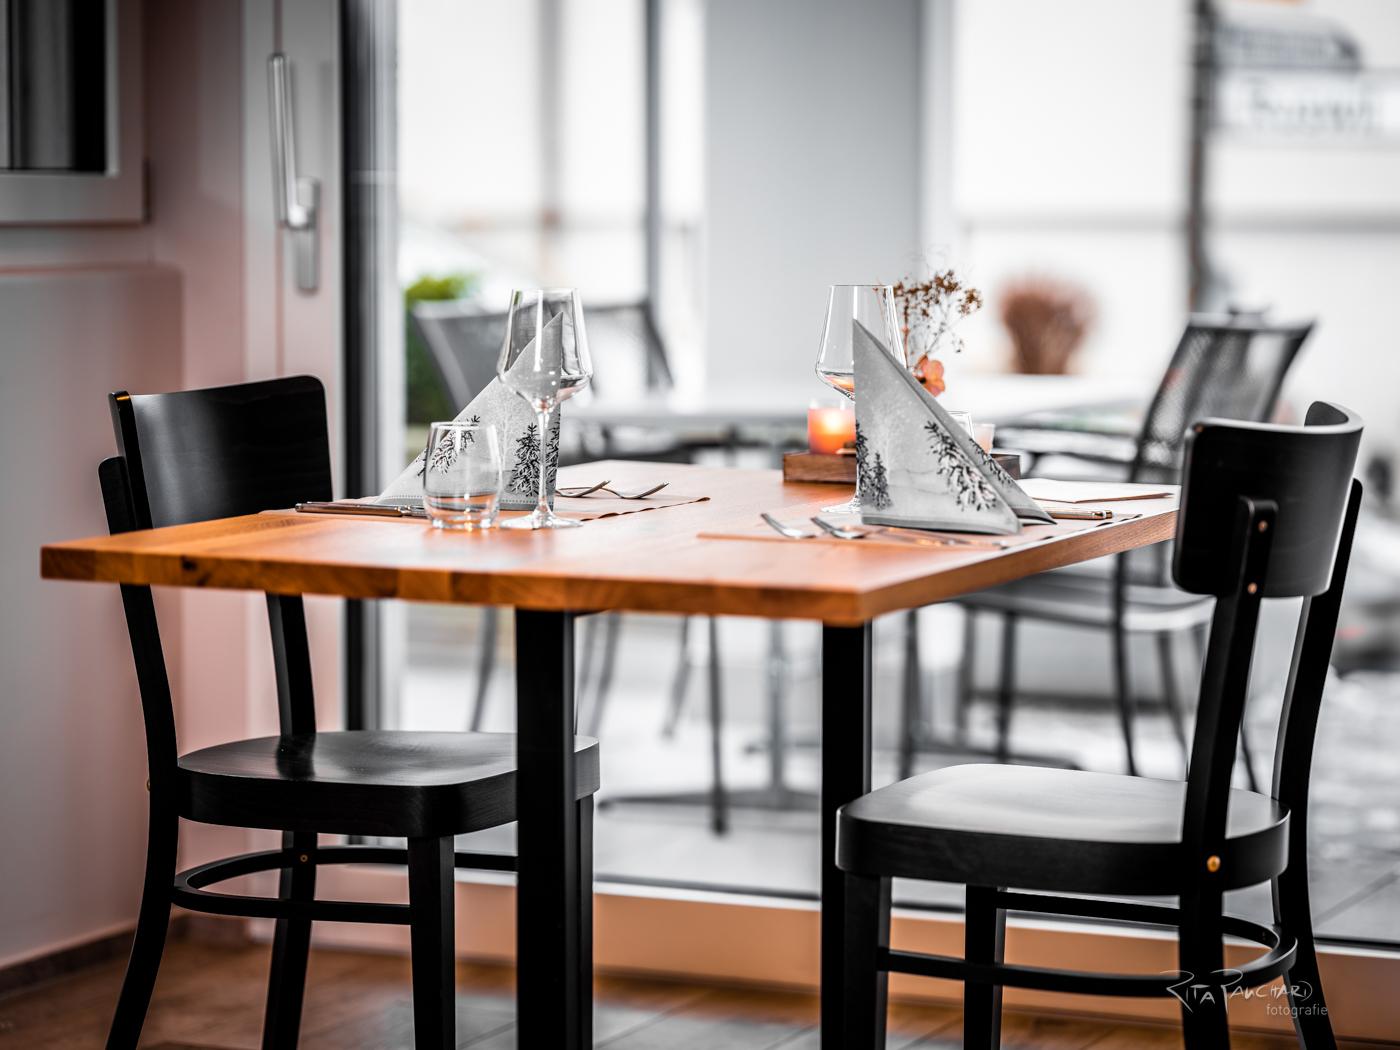 restaurantfotografie_gastrofotografie-5036.jpg